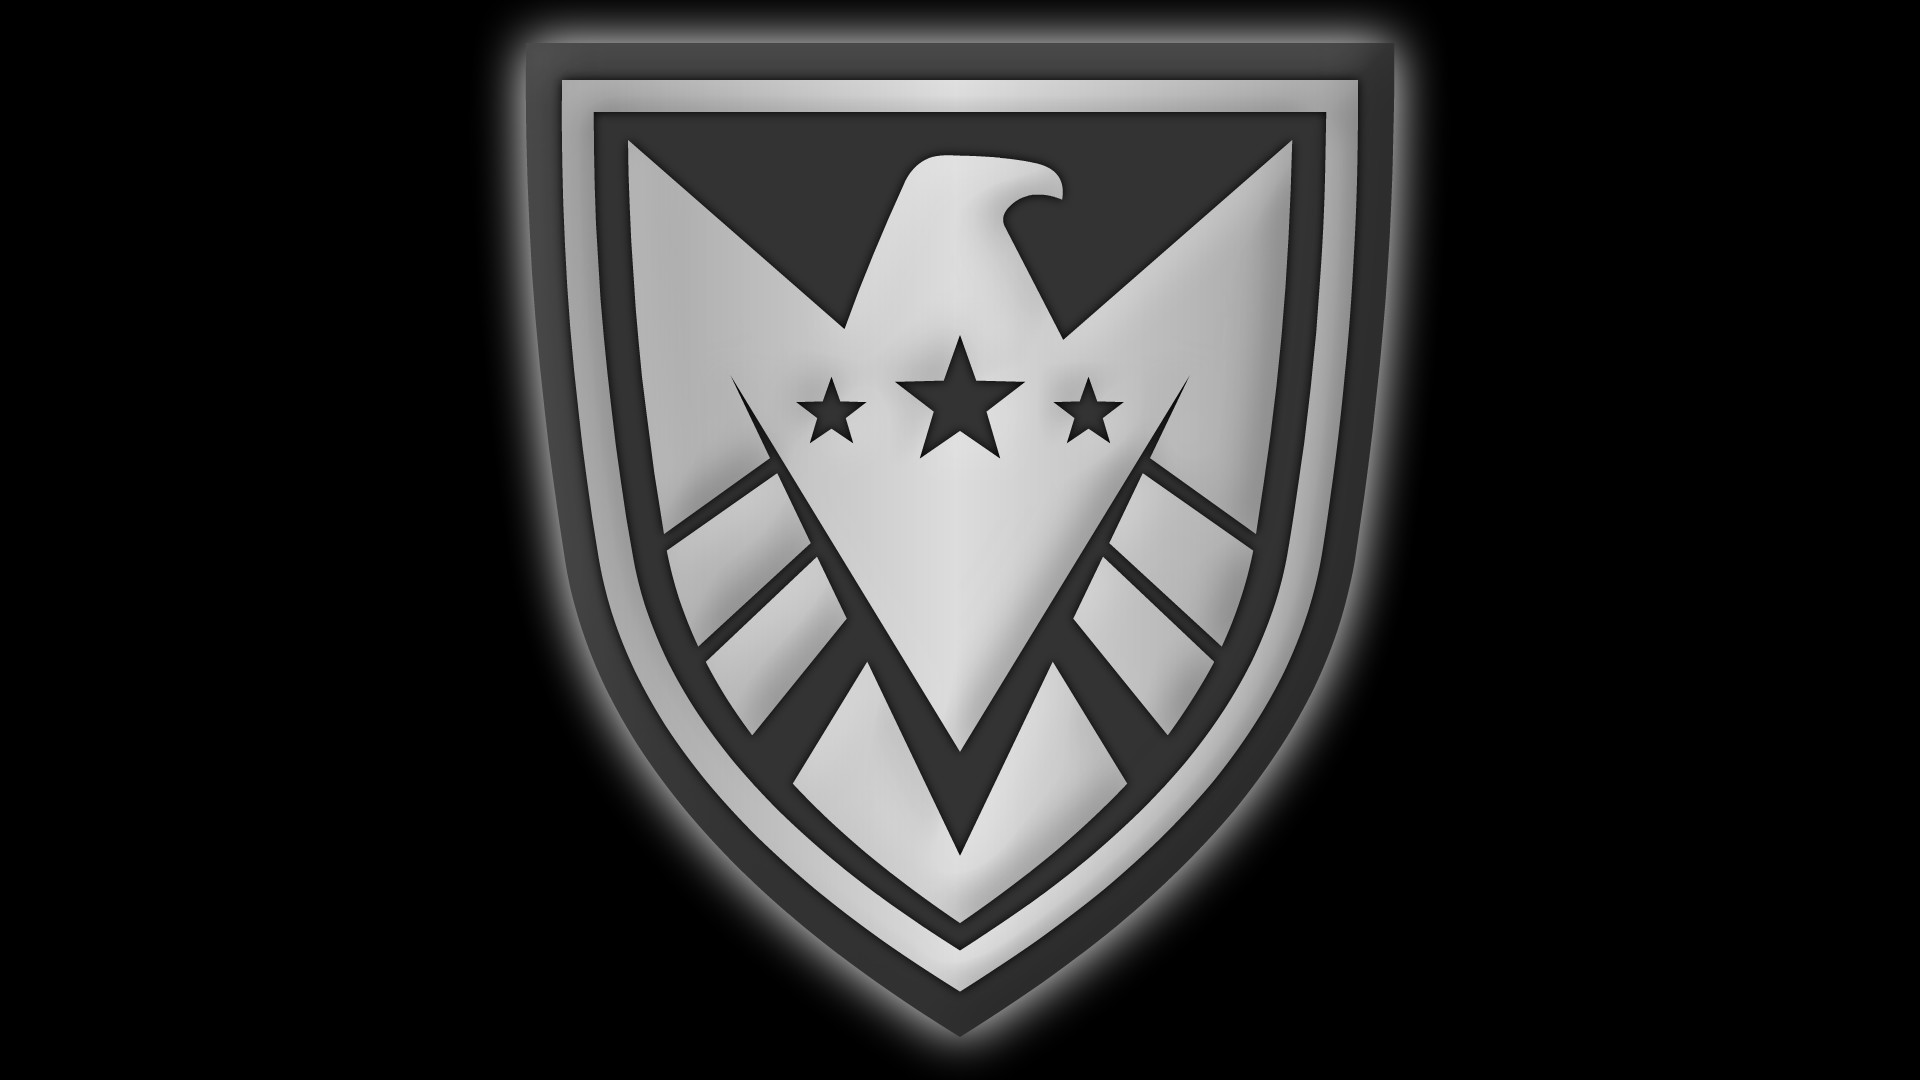 New S.H.I.E.L.D. Symbol by Yurtigo New S.H.I.E.L.D. Symbol by Yurtigo